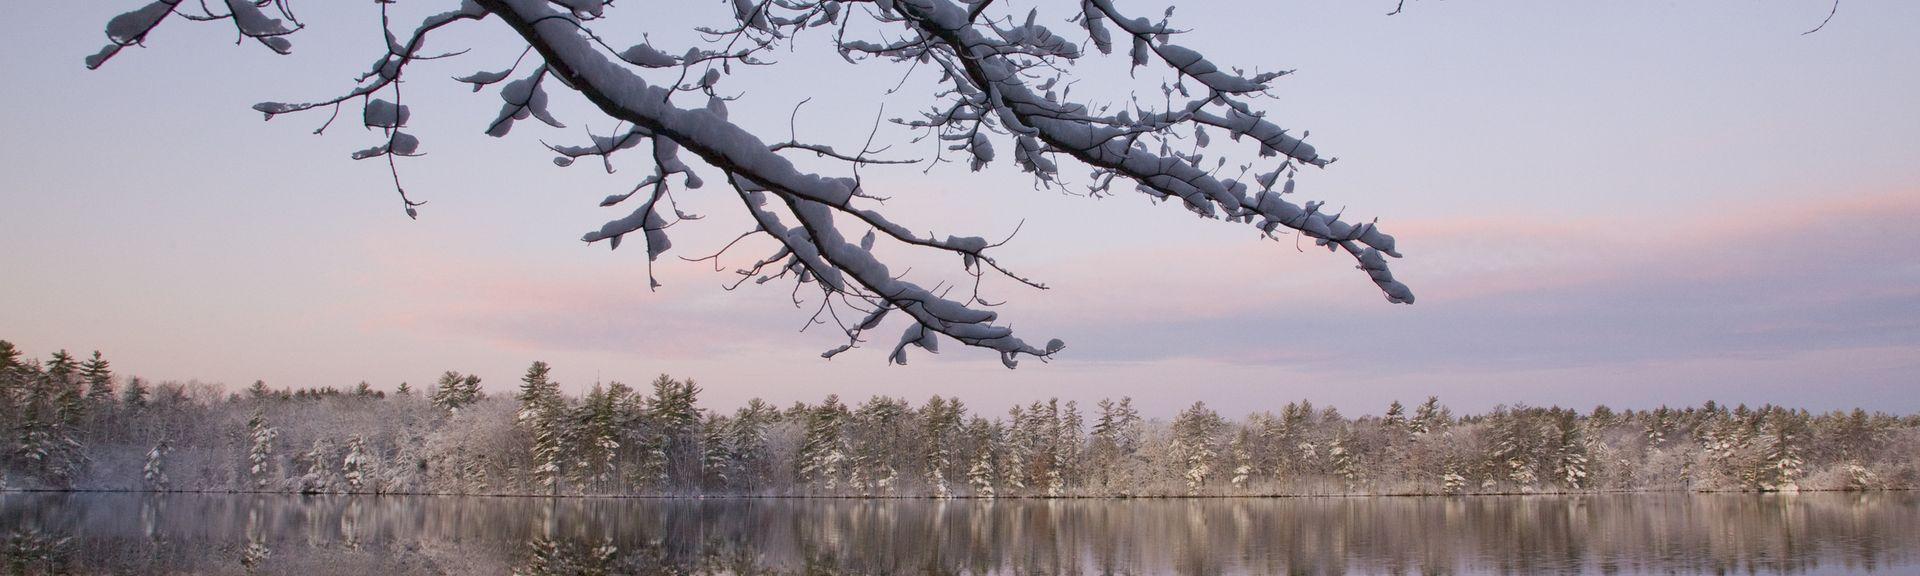 Lake Arrowhead, Maine, Estados Unidos